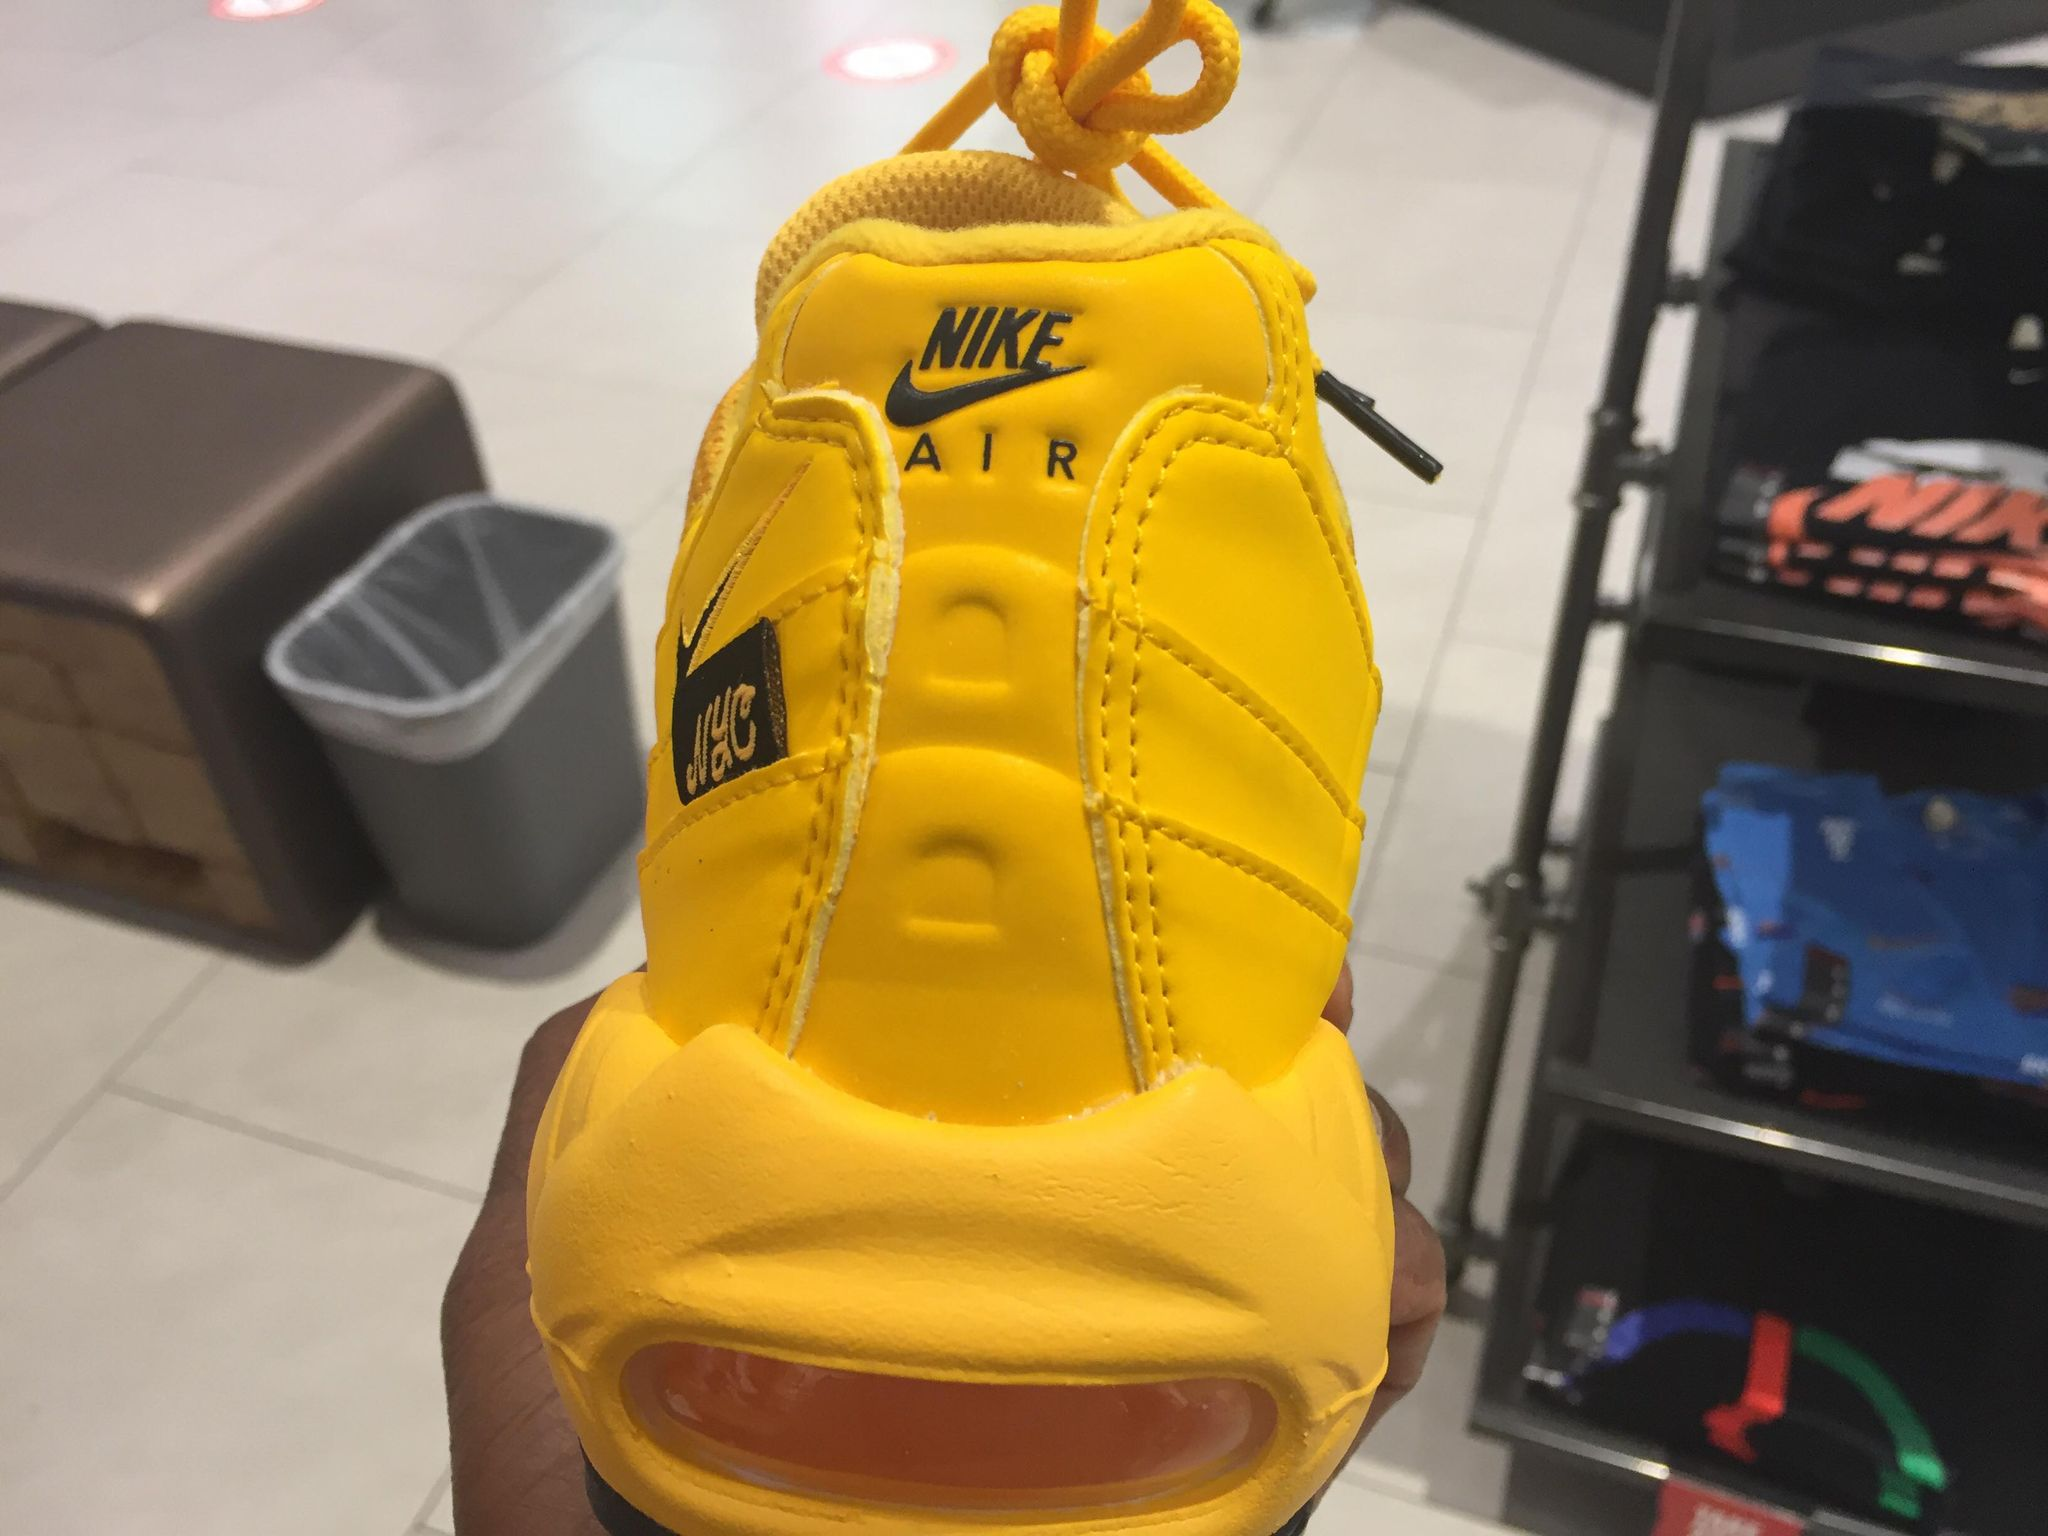 Nike Air Max 95 NYC Taxi New York City DH0143-700